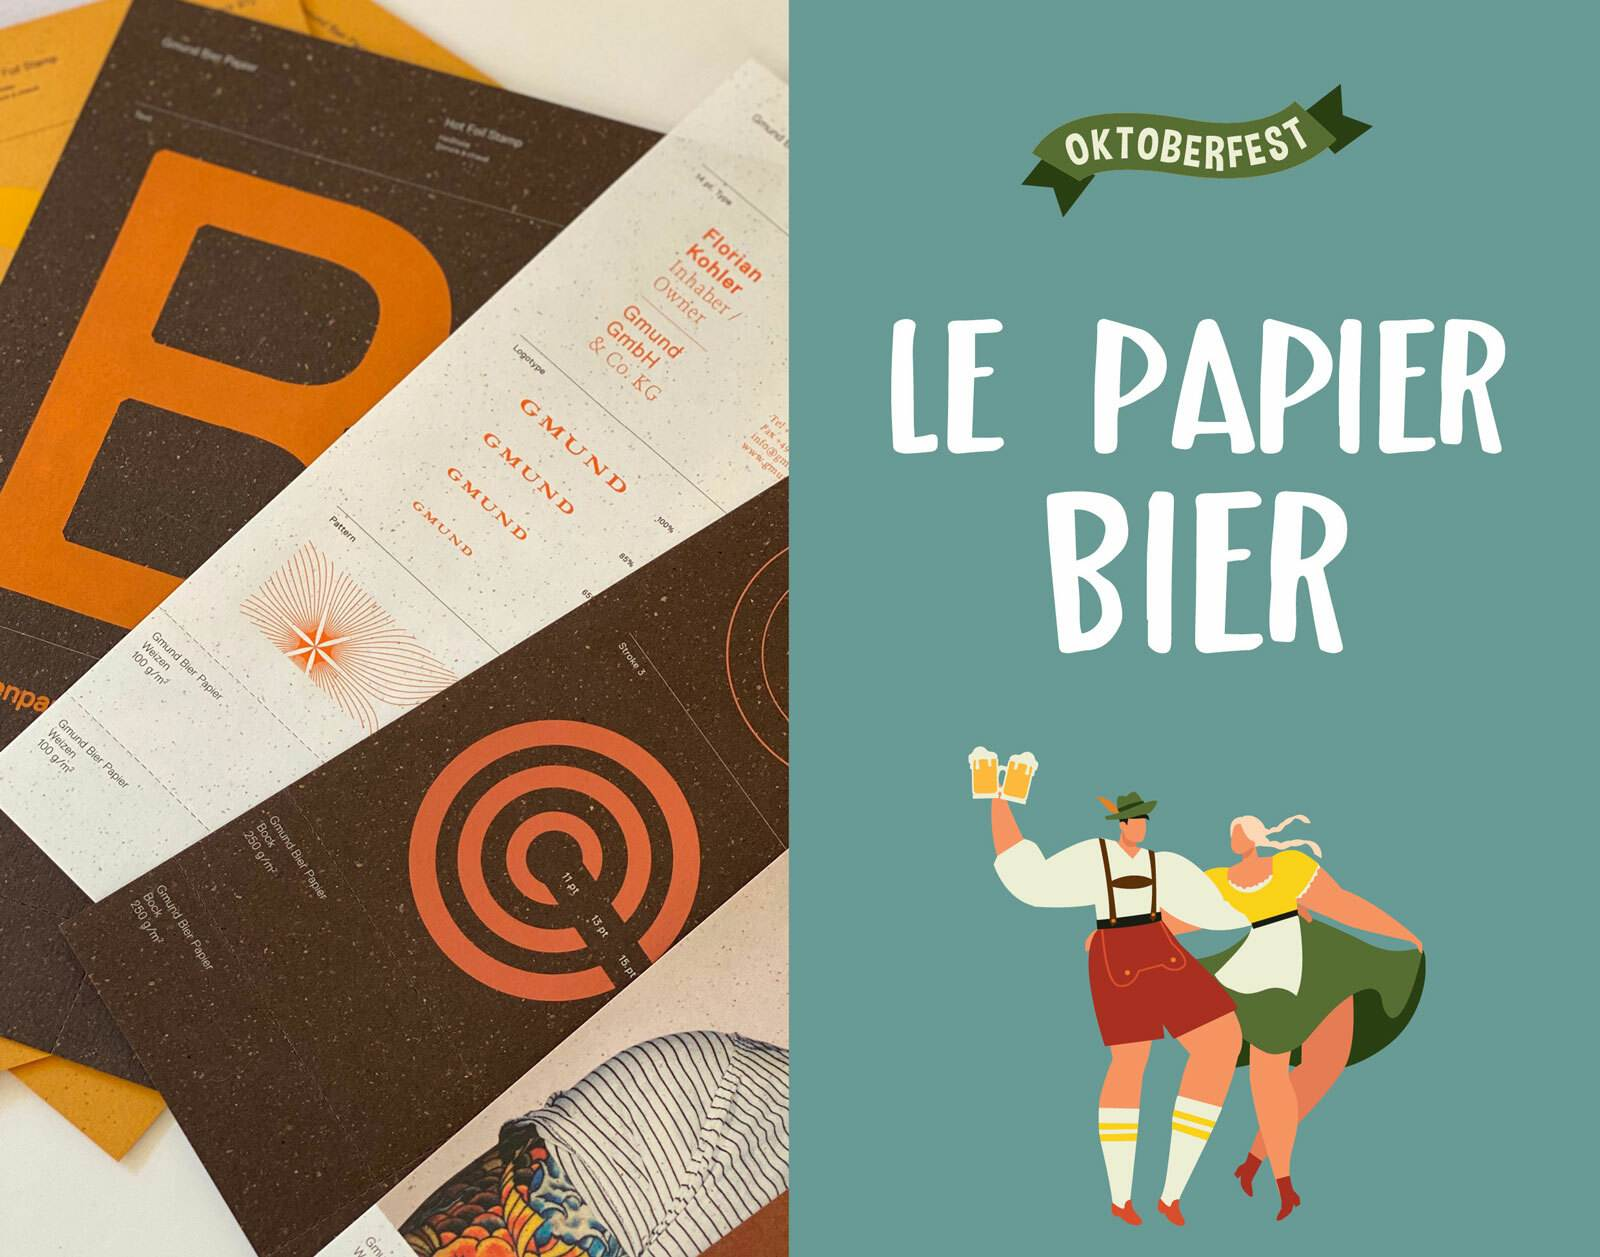 papier-bier-gmund-grafik-plus-xl-5